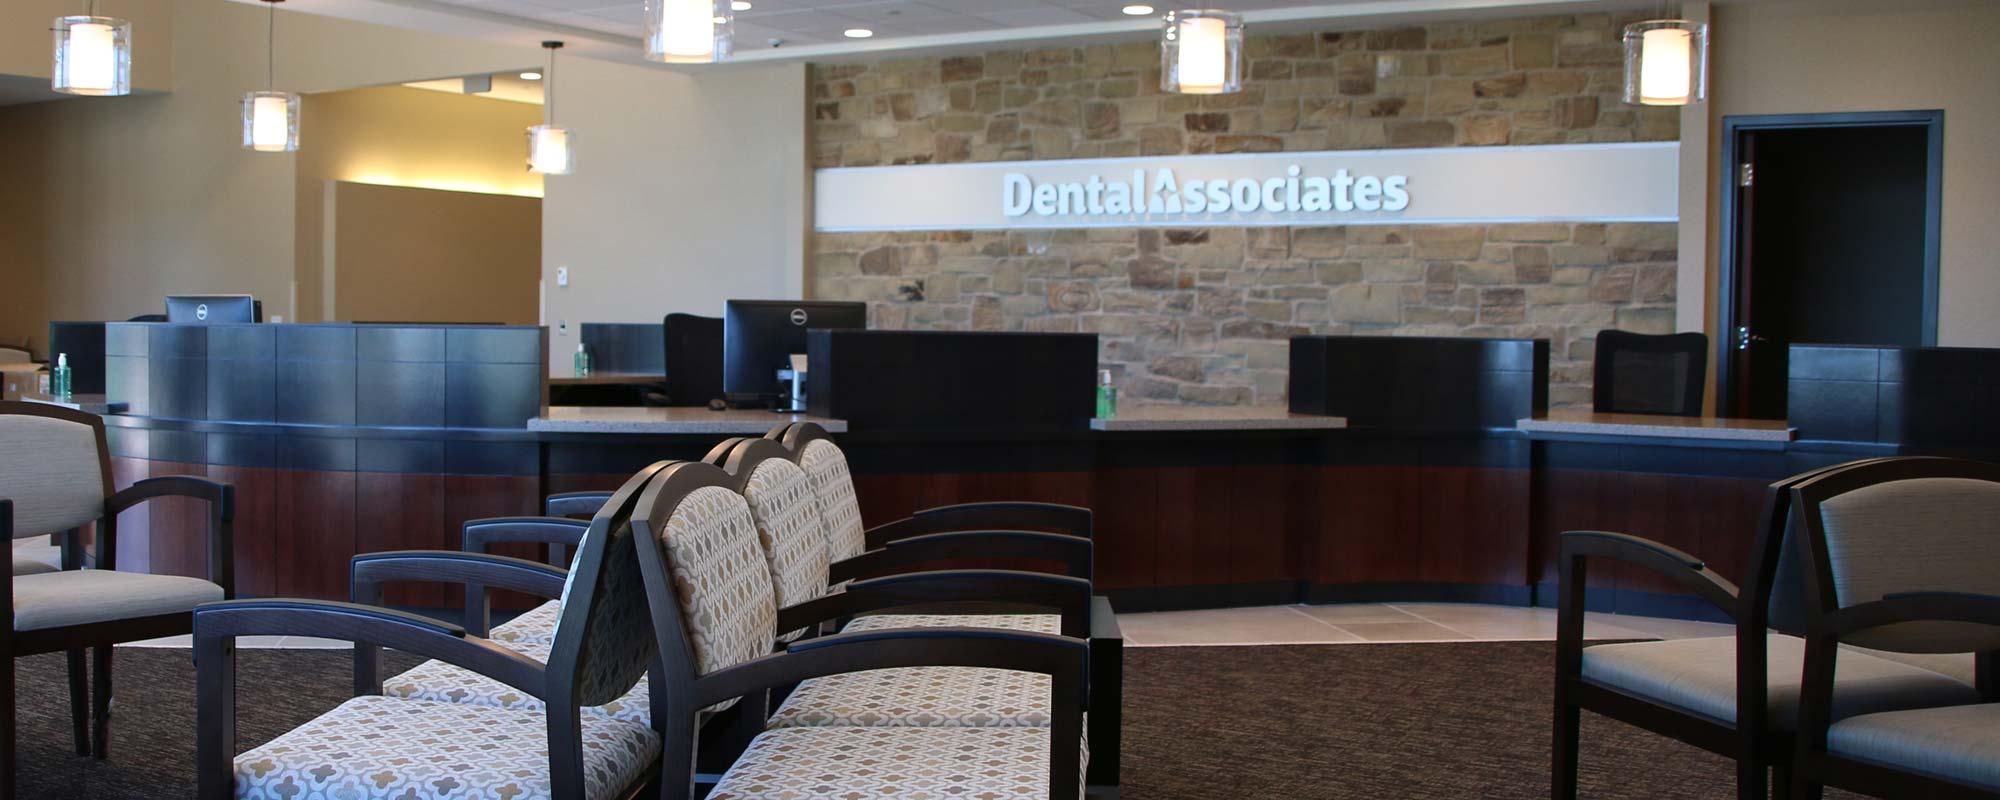 Dental Associates Waukesha